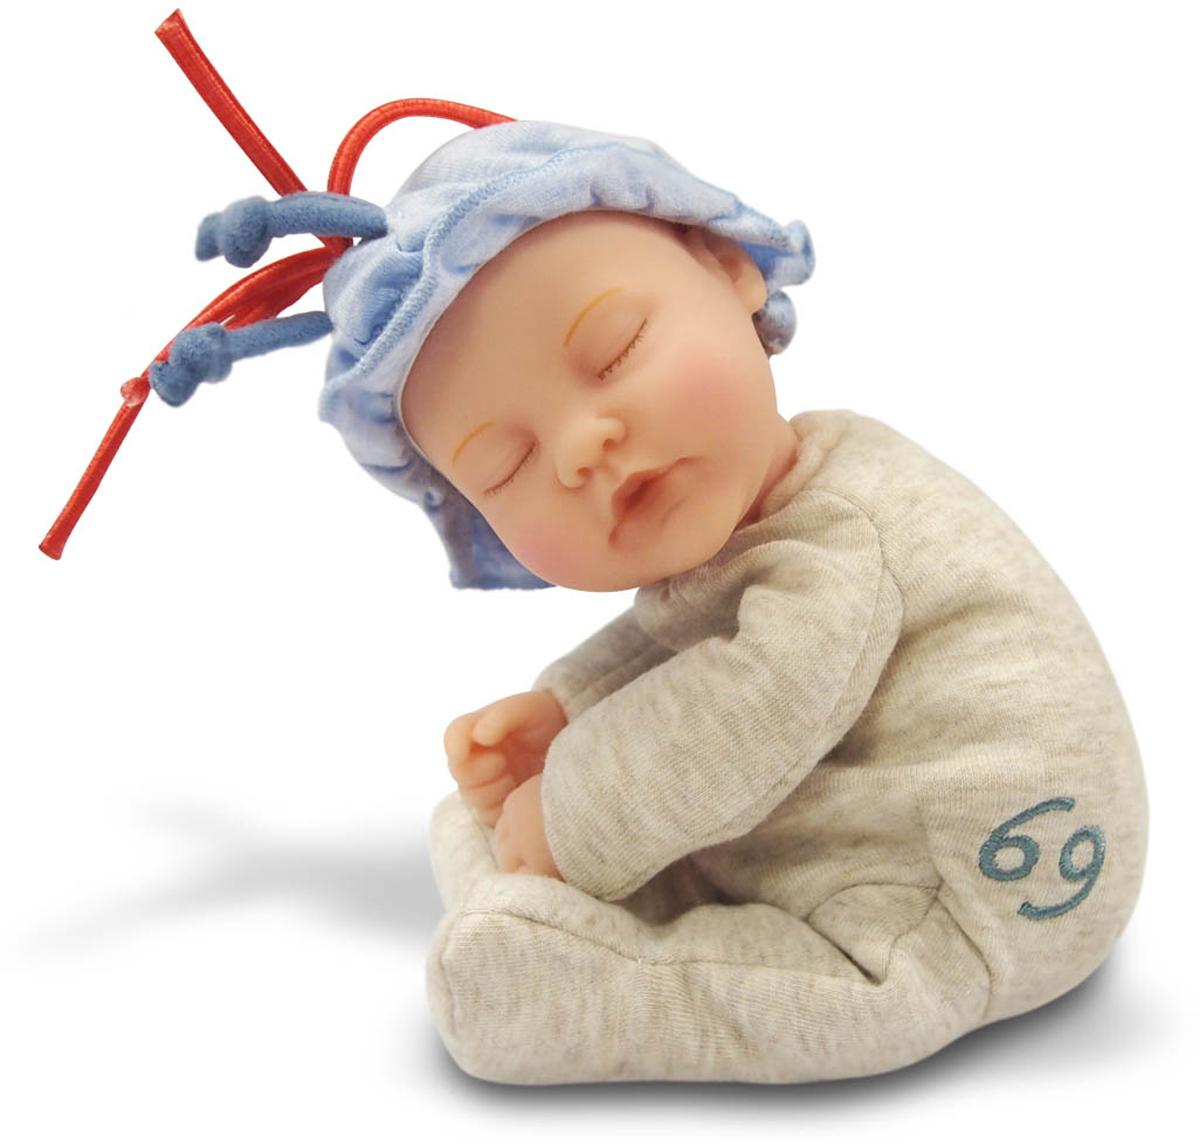 Ovation Anne Geddes Кукла Знаки зодиака Рак